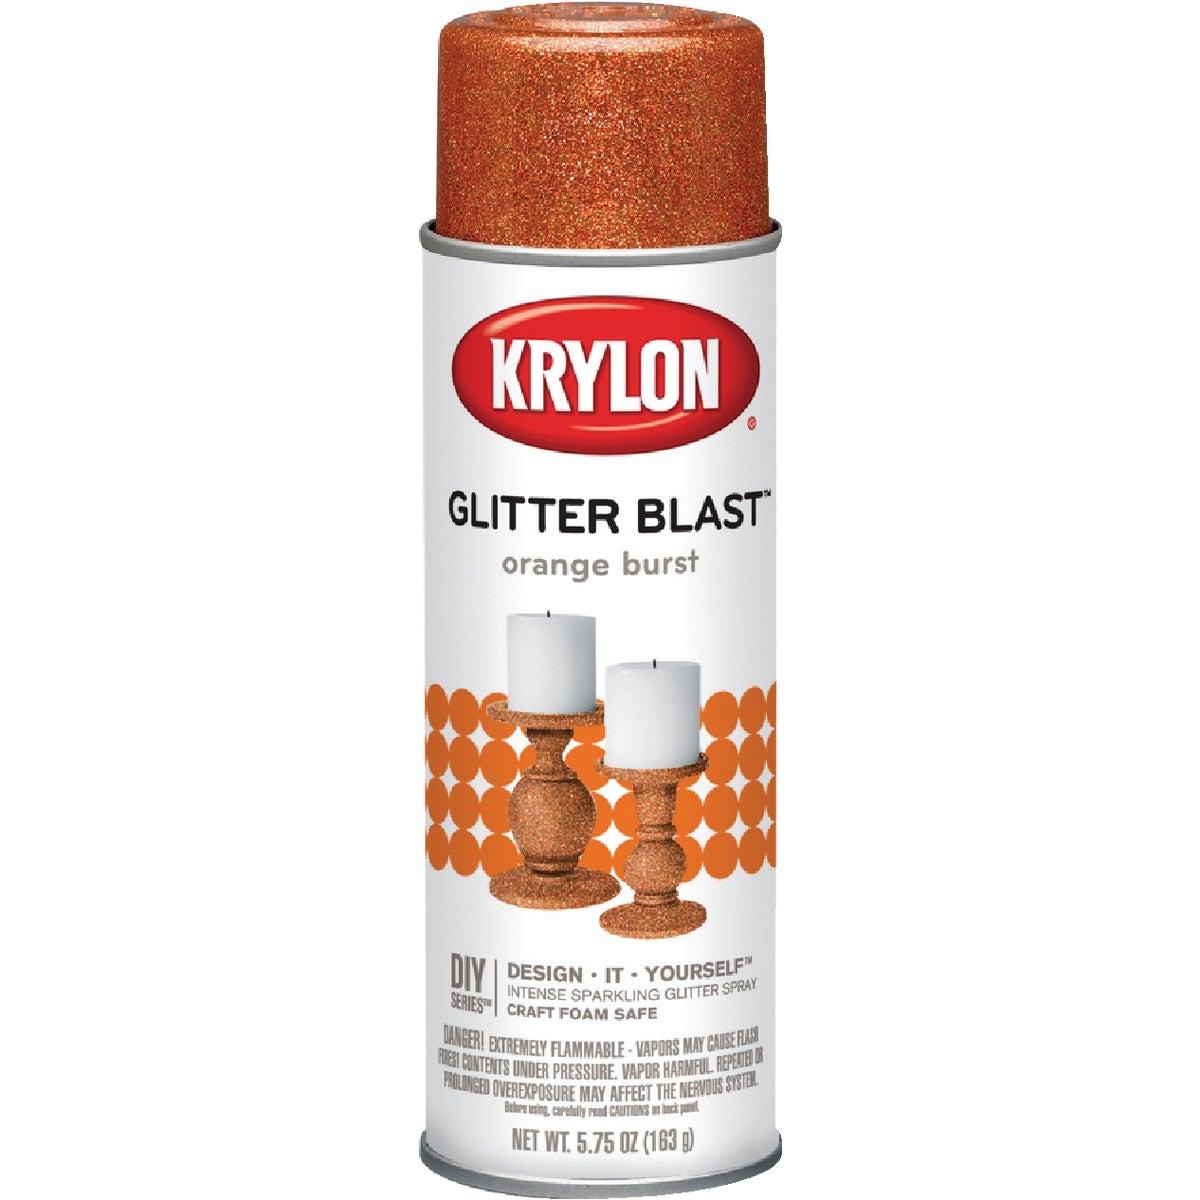 ORNG BURST GLITTER SPRAY - K03870000 by Krylon/consumer Div